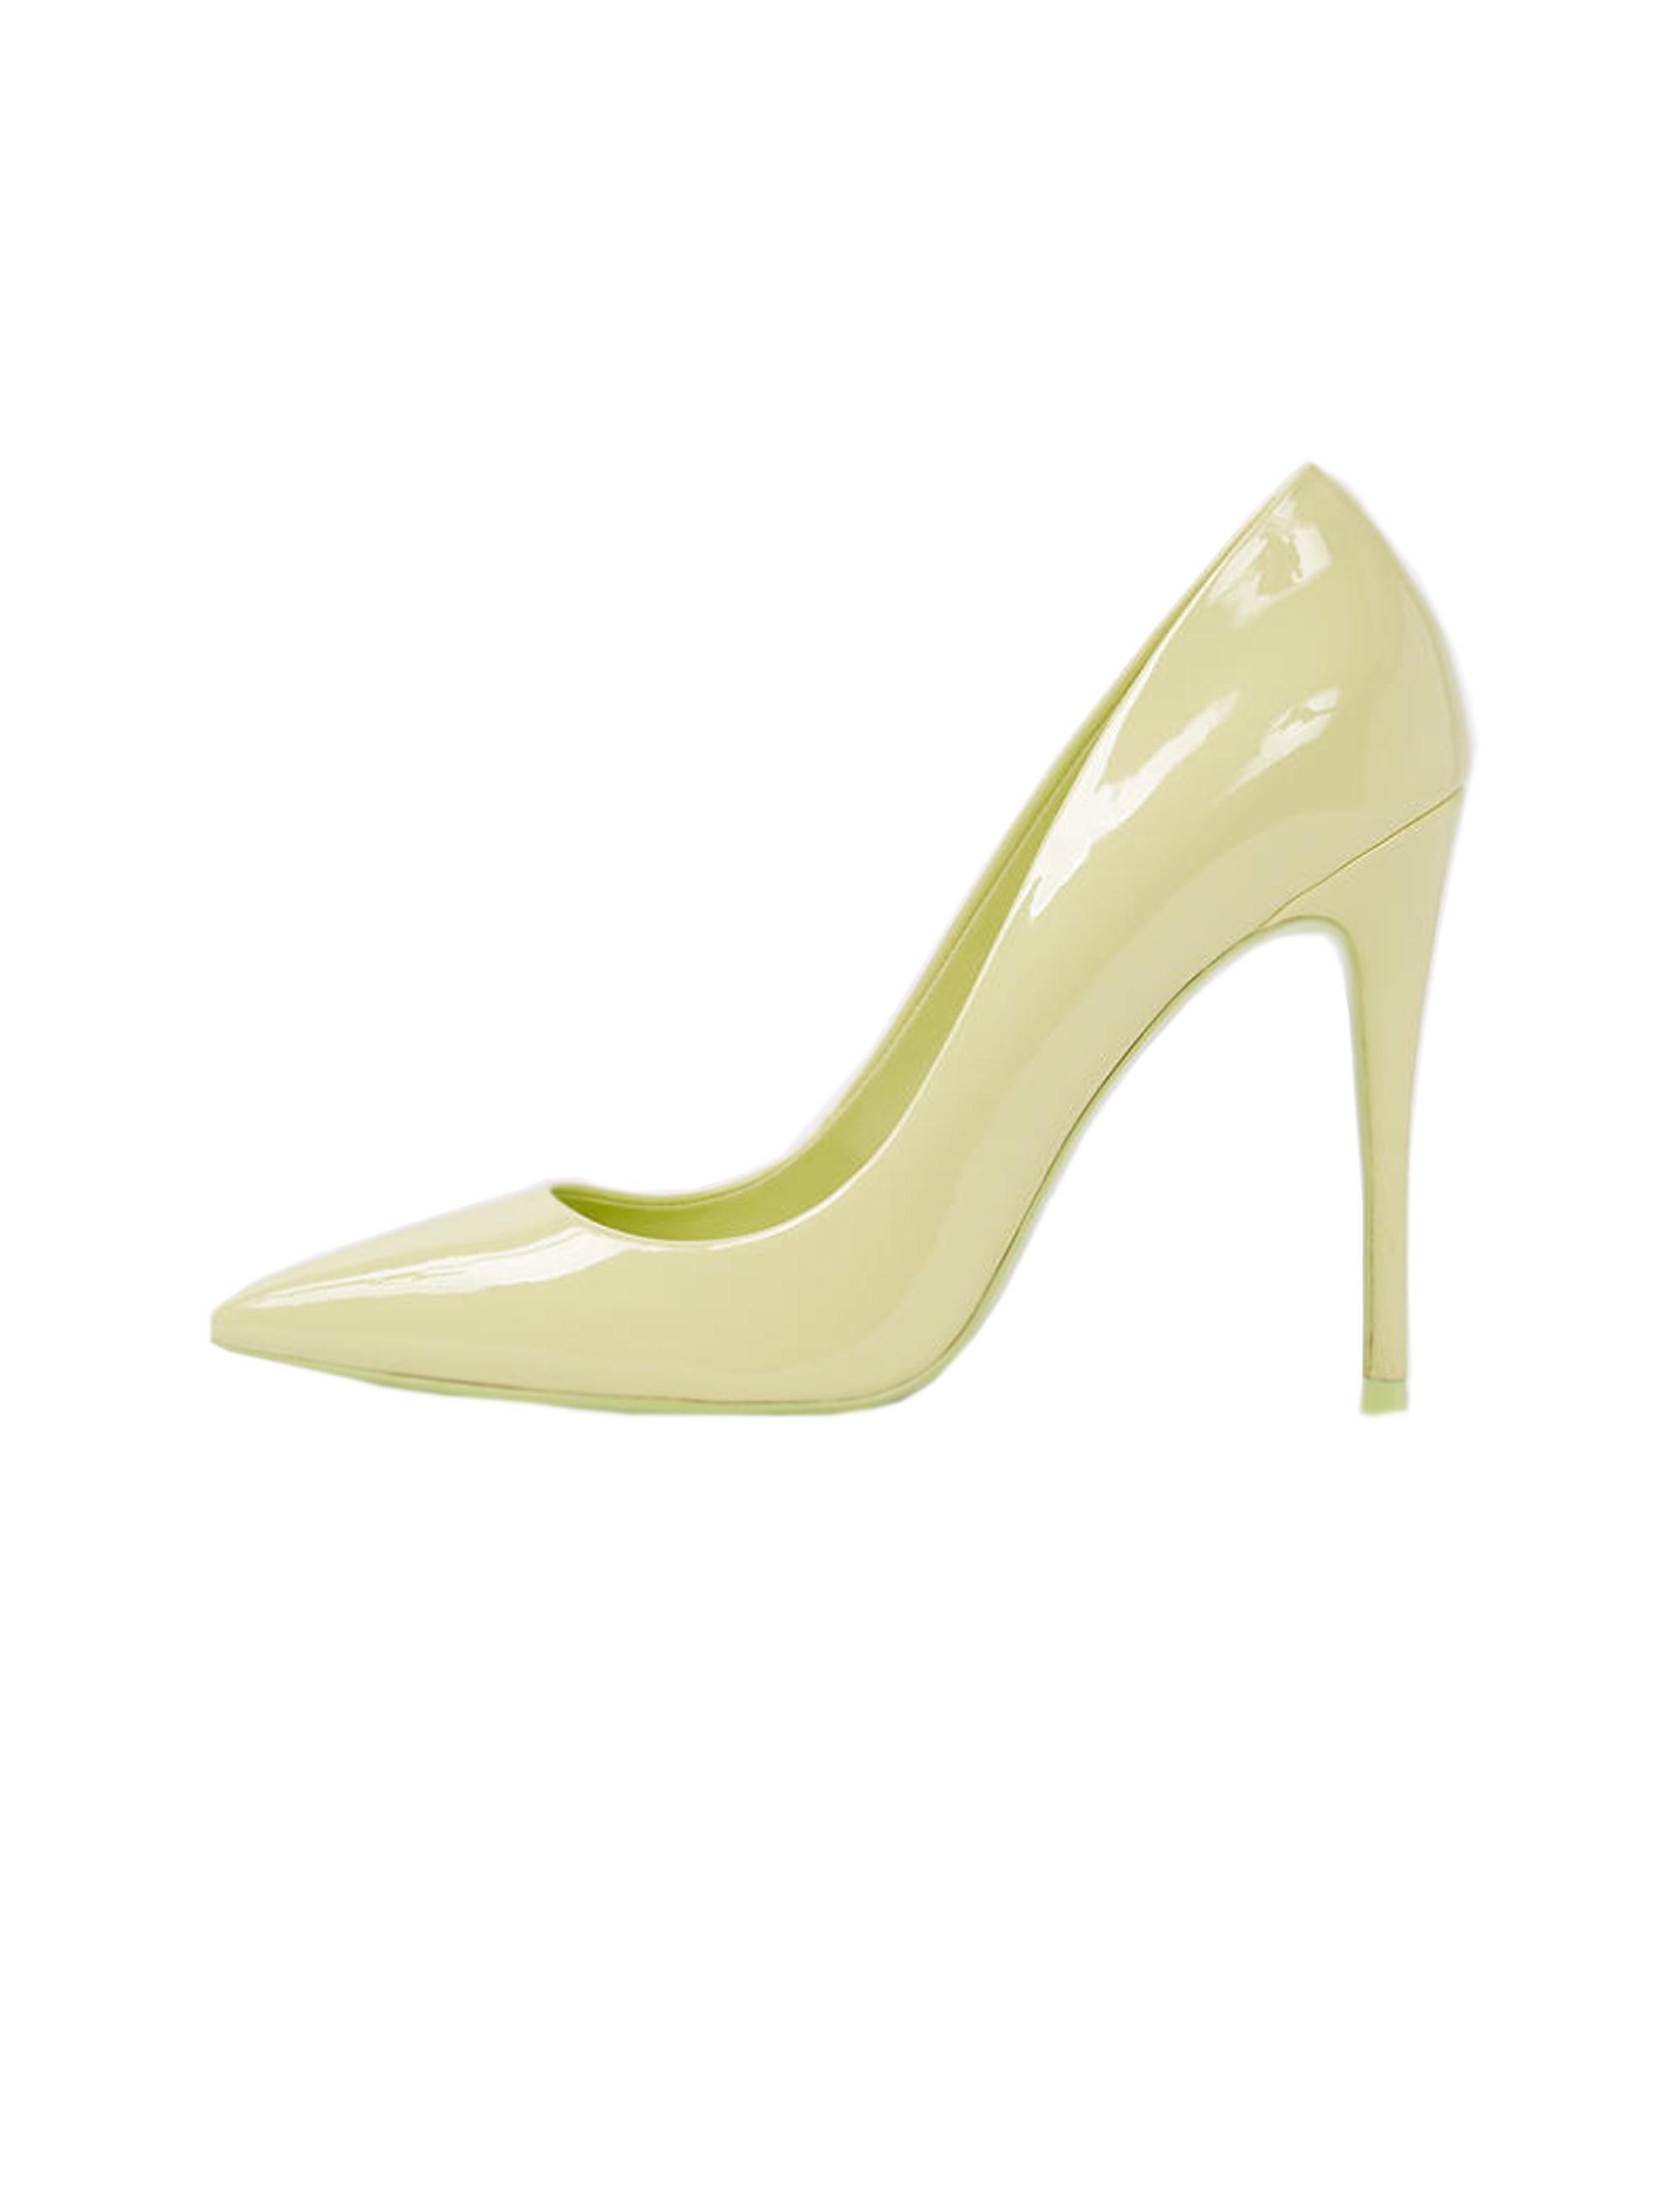 کفش پاشنه بلند زنانه - آلدو - سبز فسفري - 3